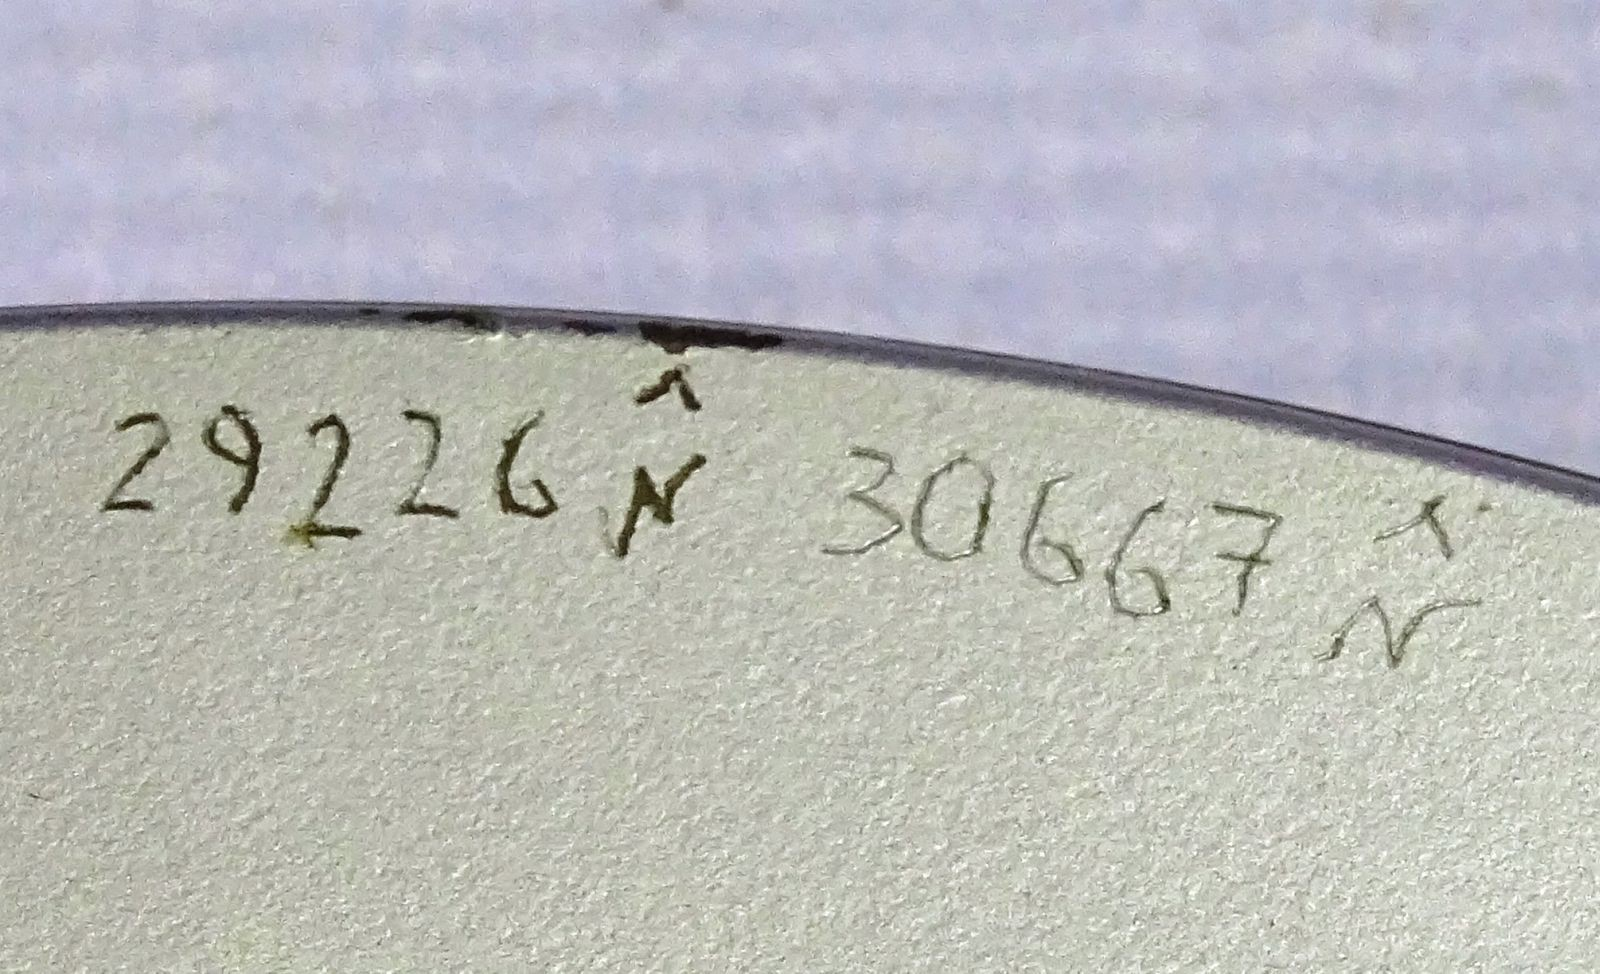 DSC02275.JPG (1600×974)